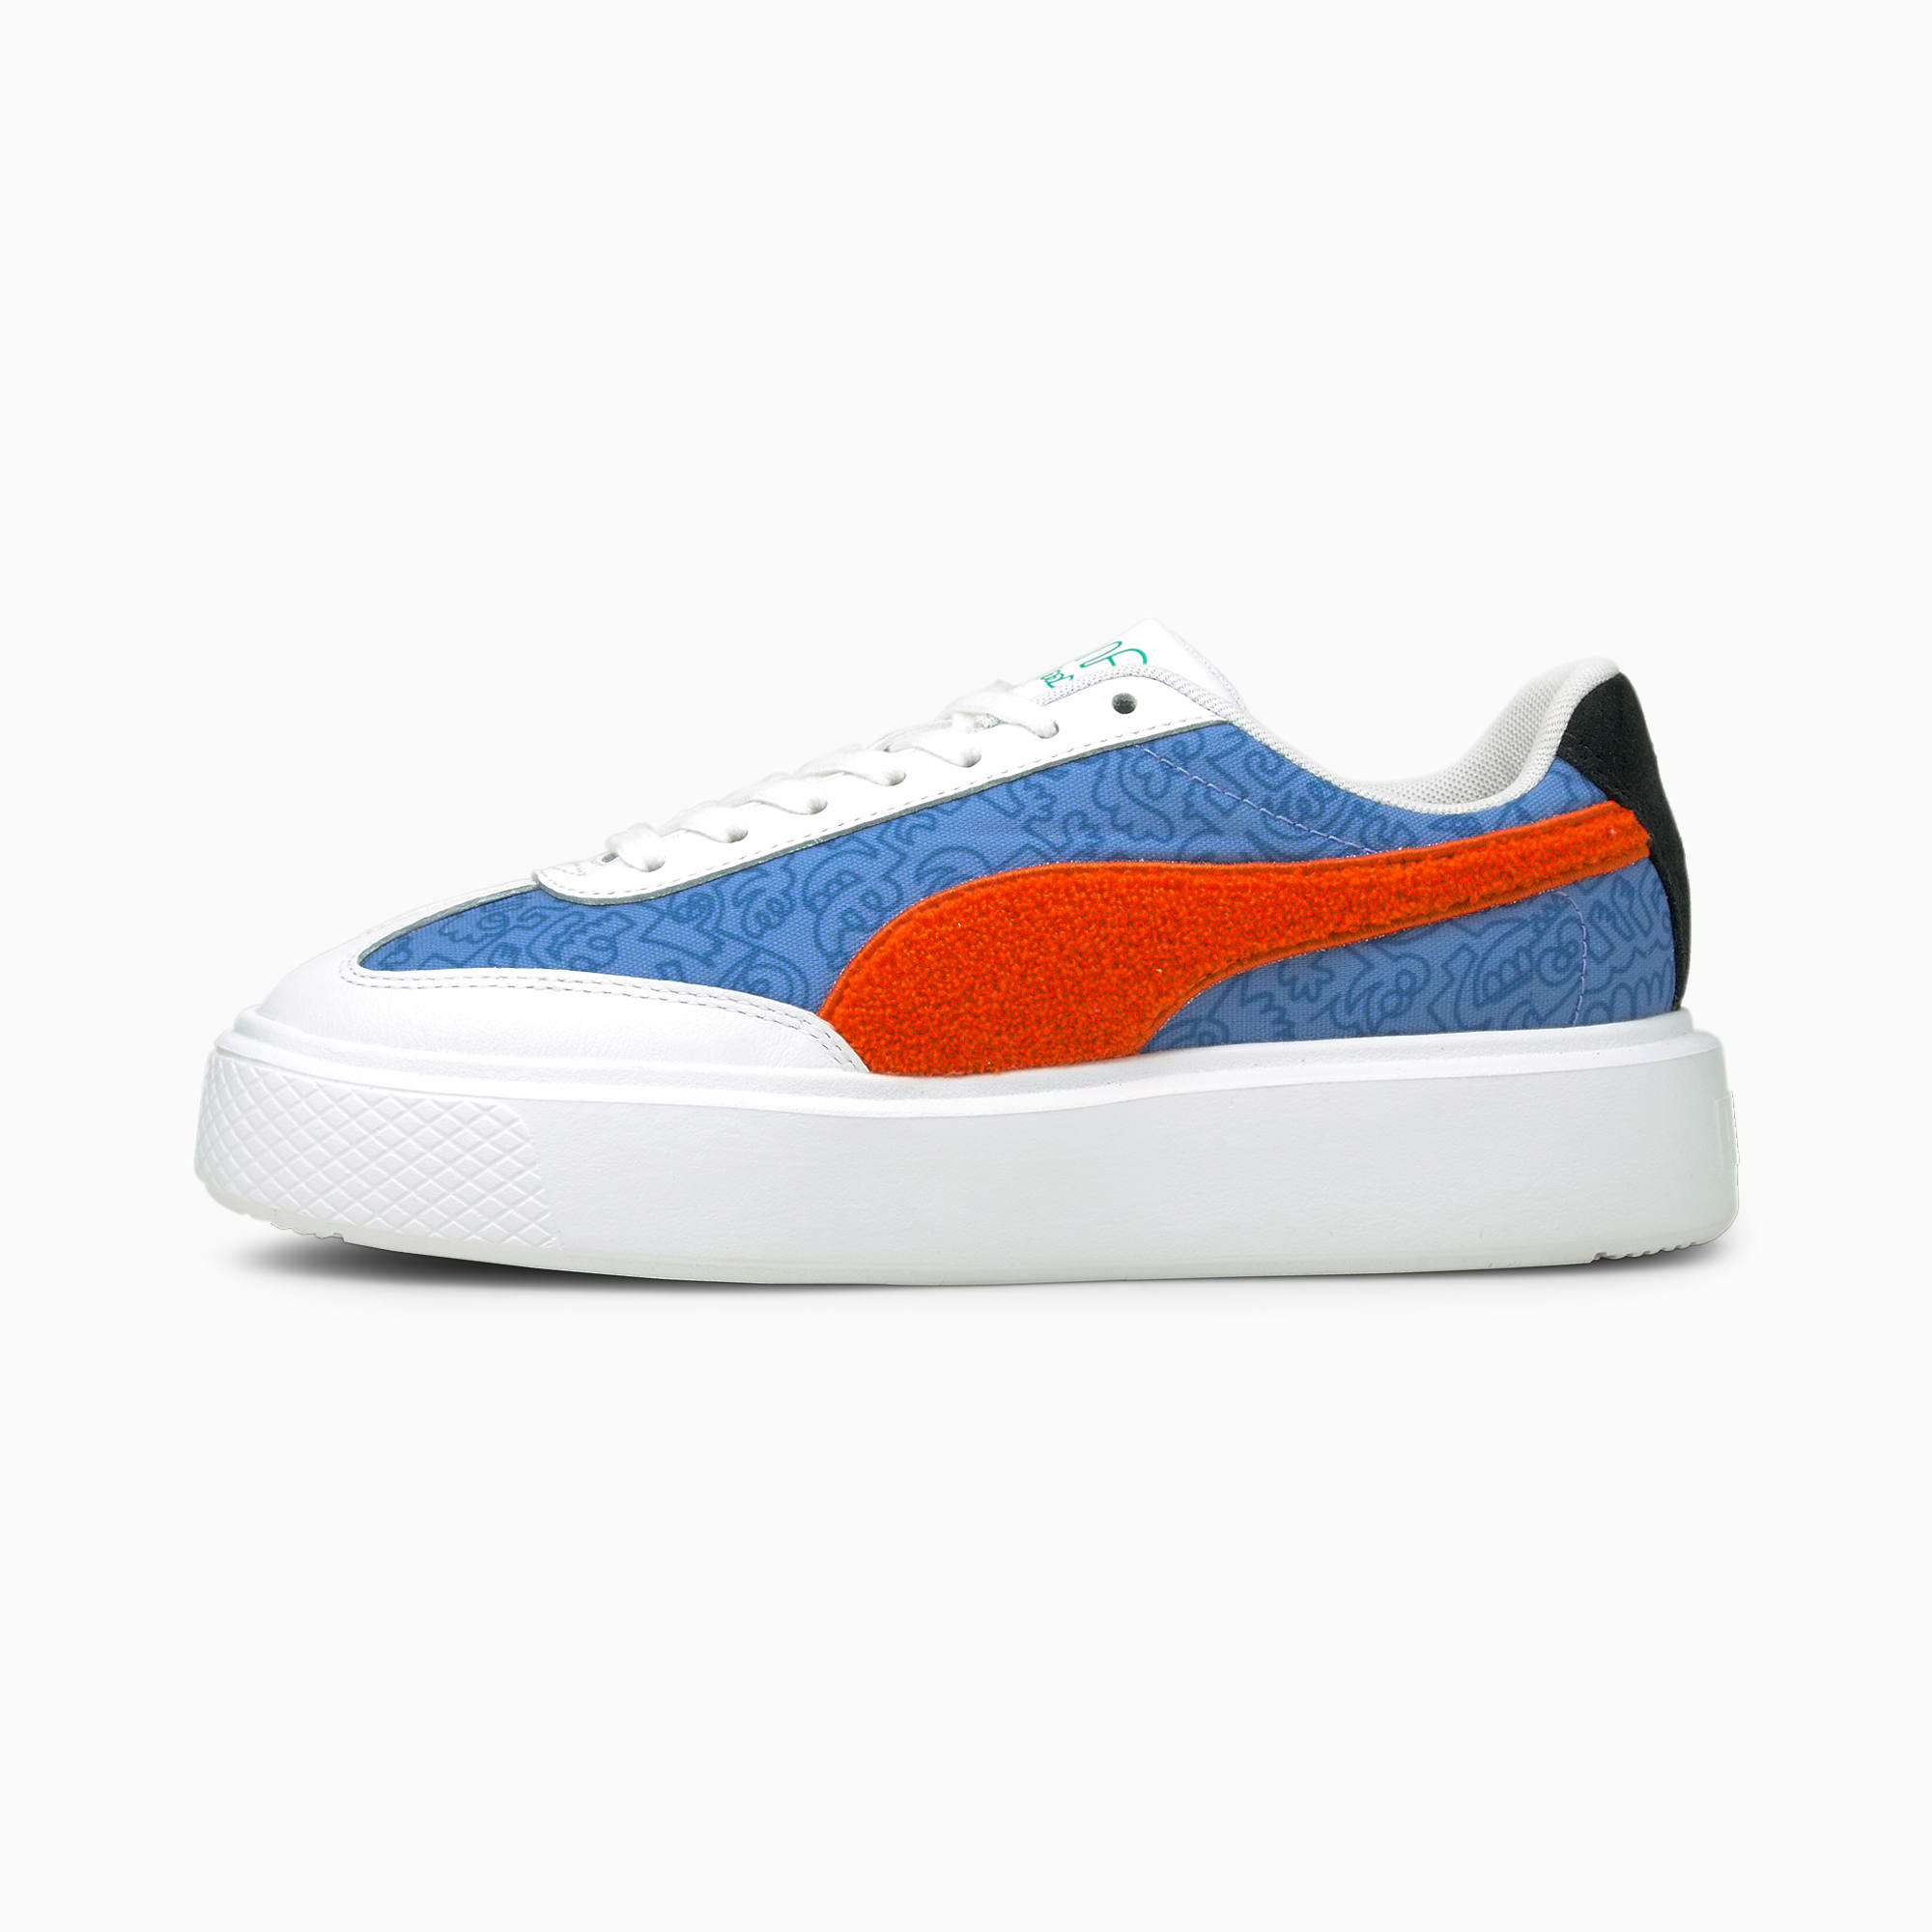 PUMA x MR. DOODLE Oslo Maja Women's Sneakers